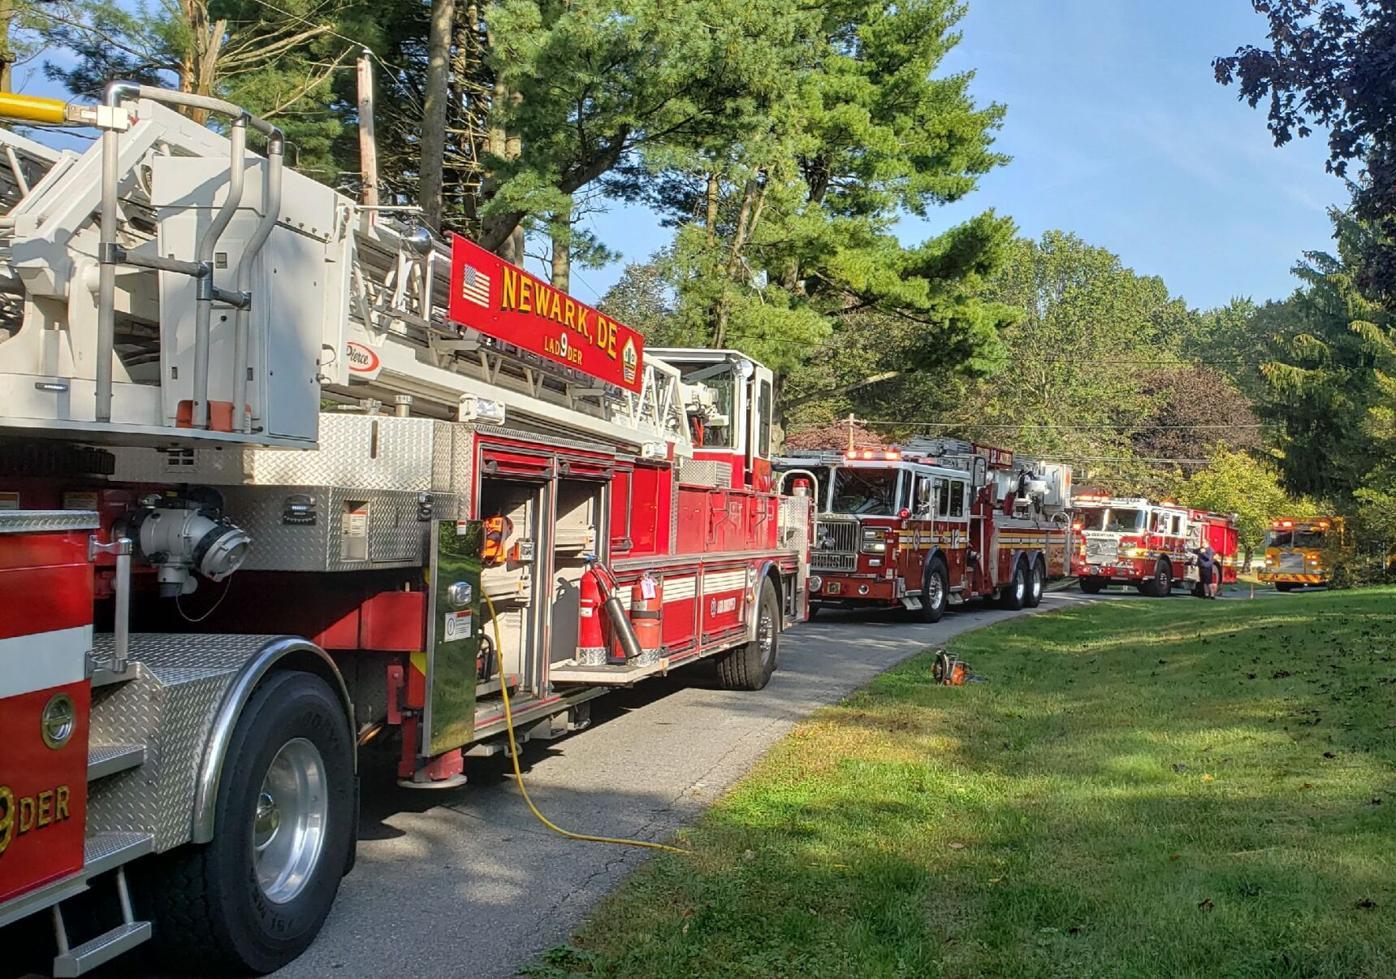 Bridle Brook Lane fire